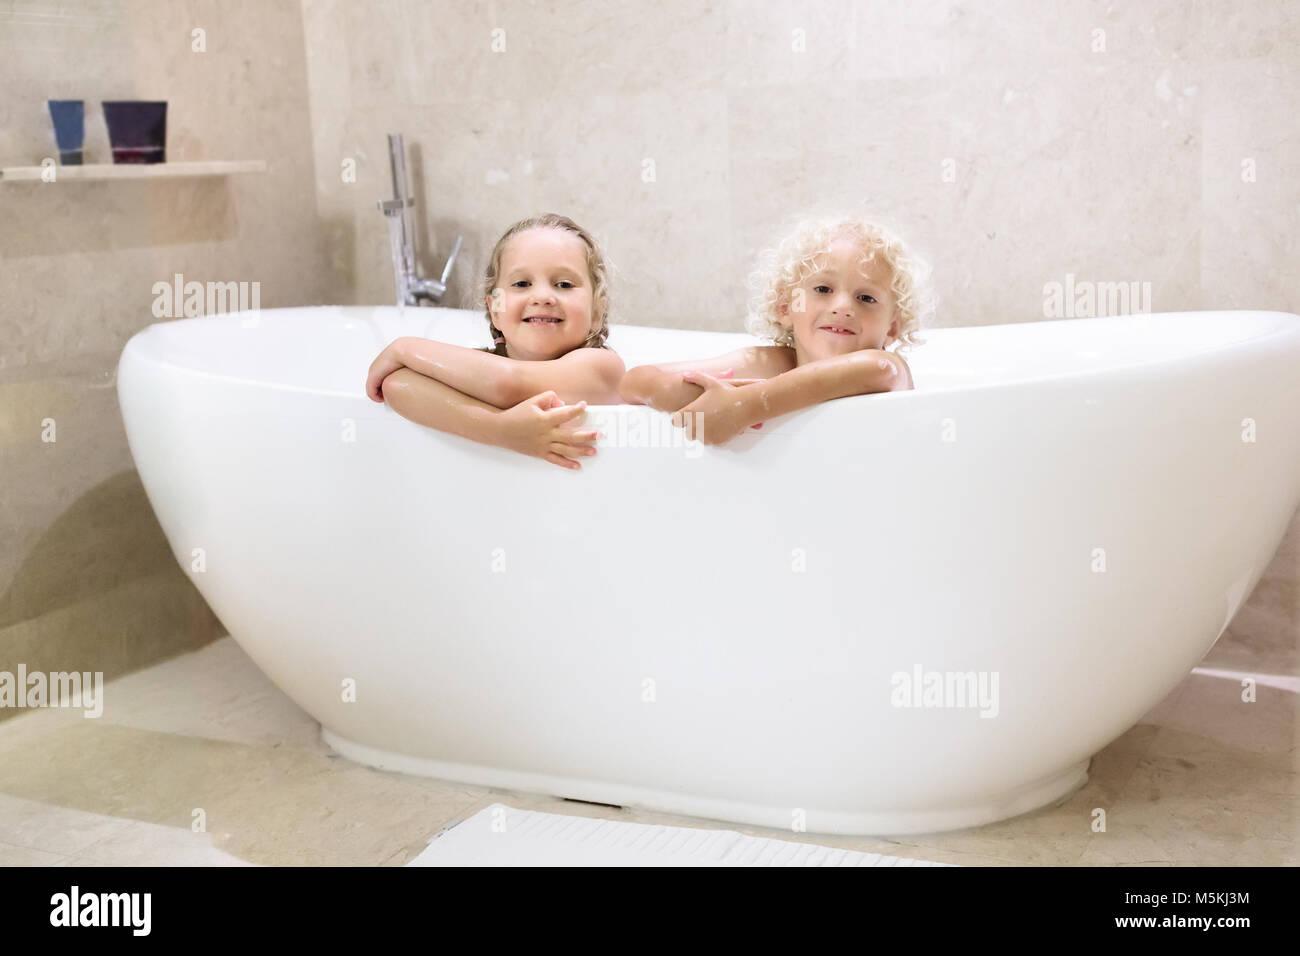 Boy Standing In Bath Tub Stock Photos Amp Boy Standing In